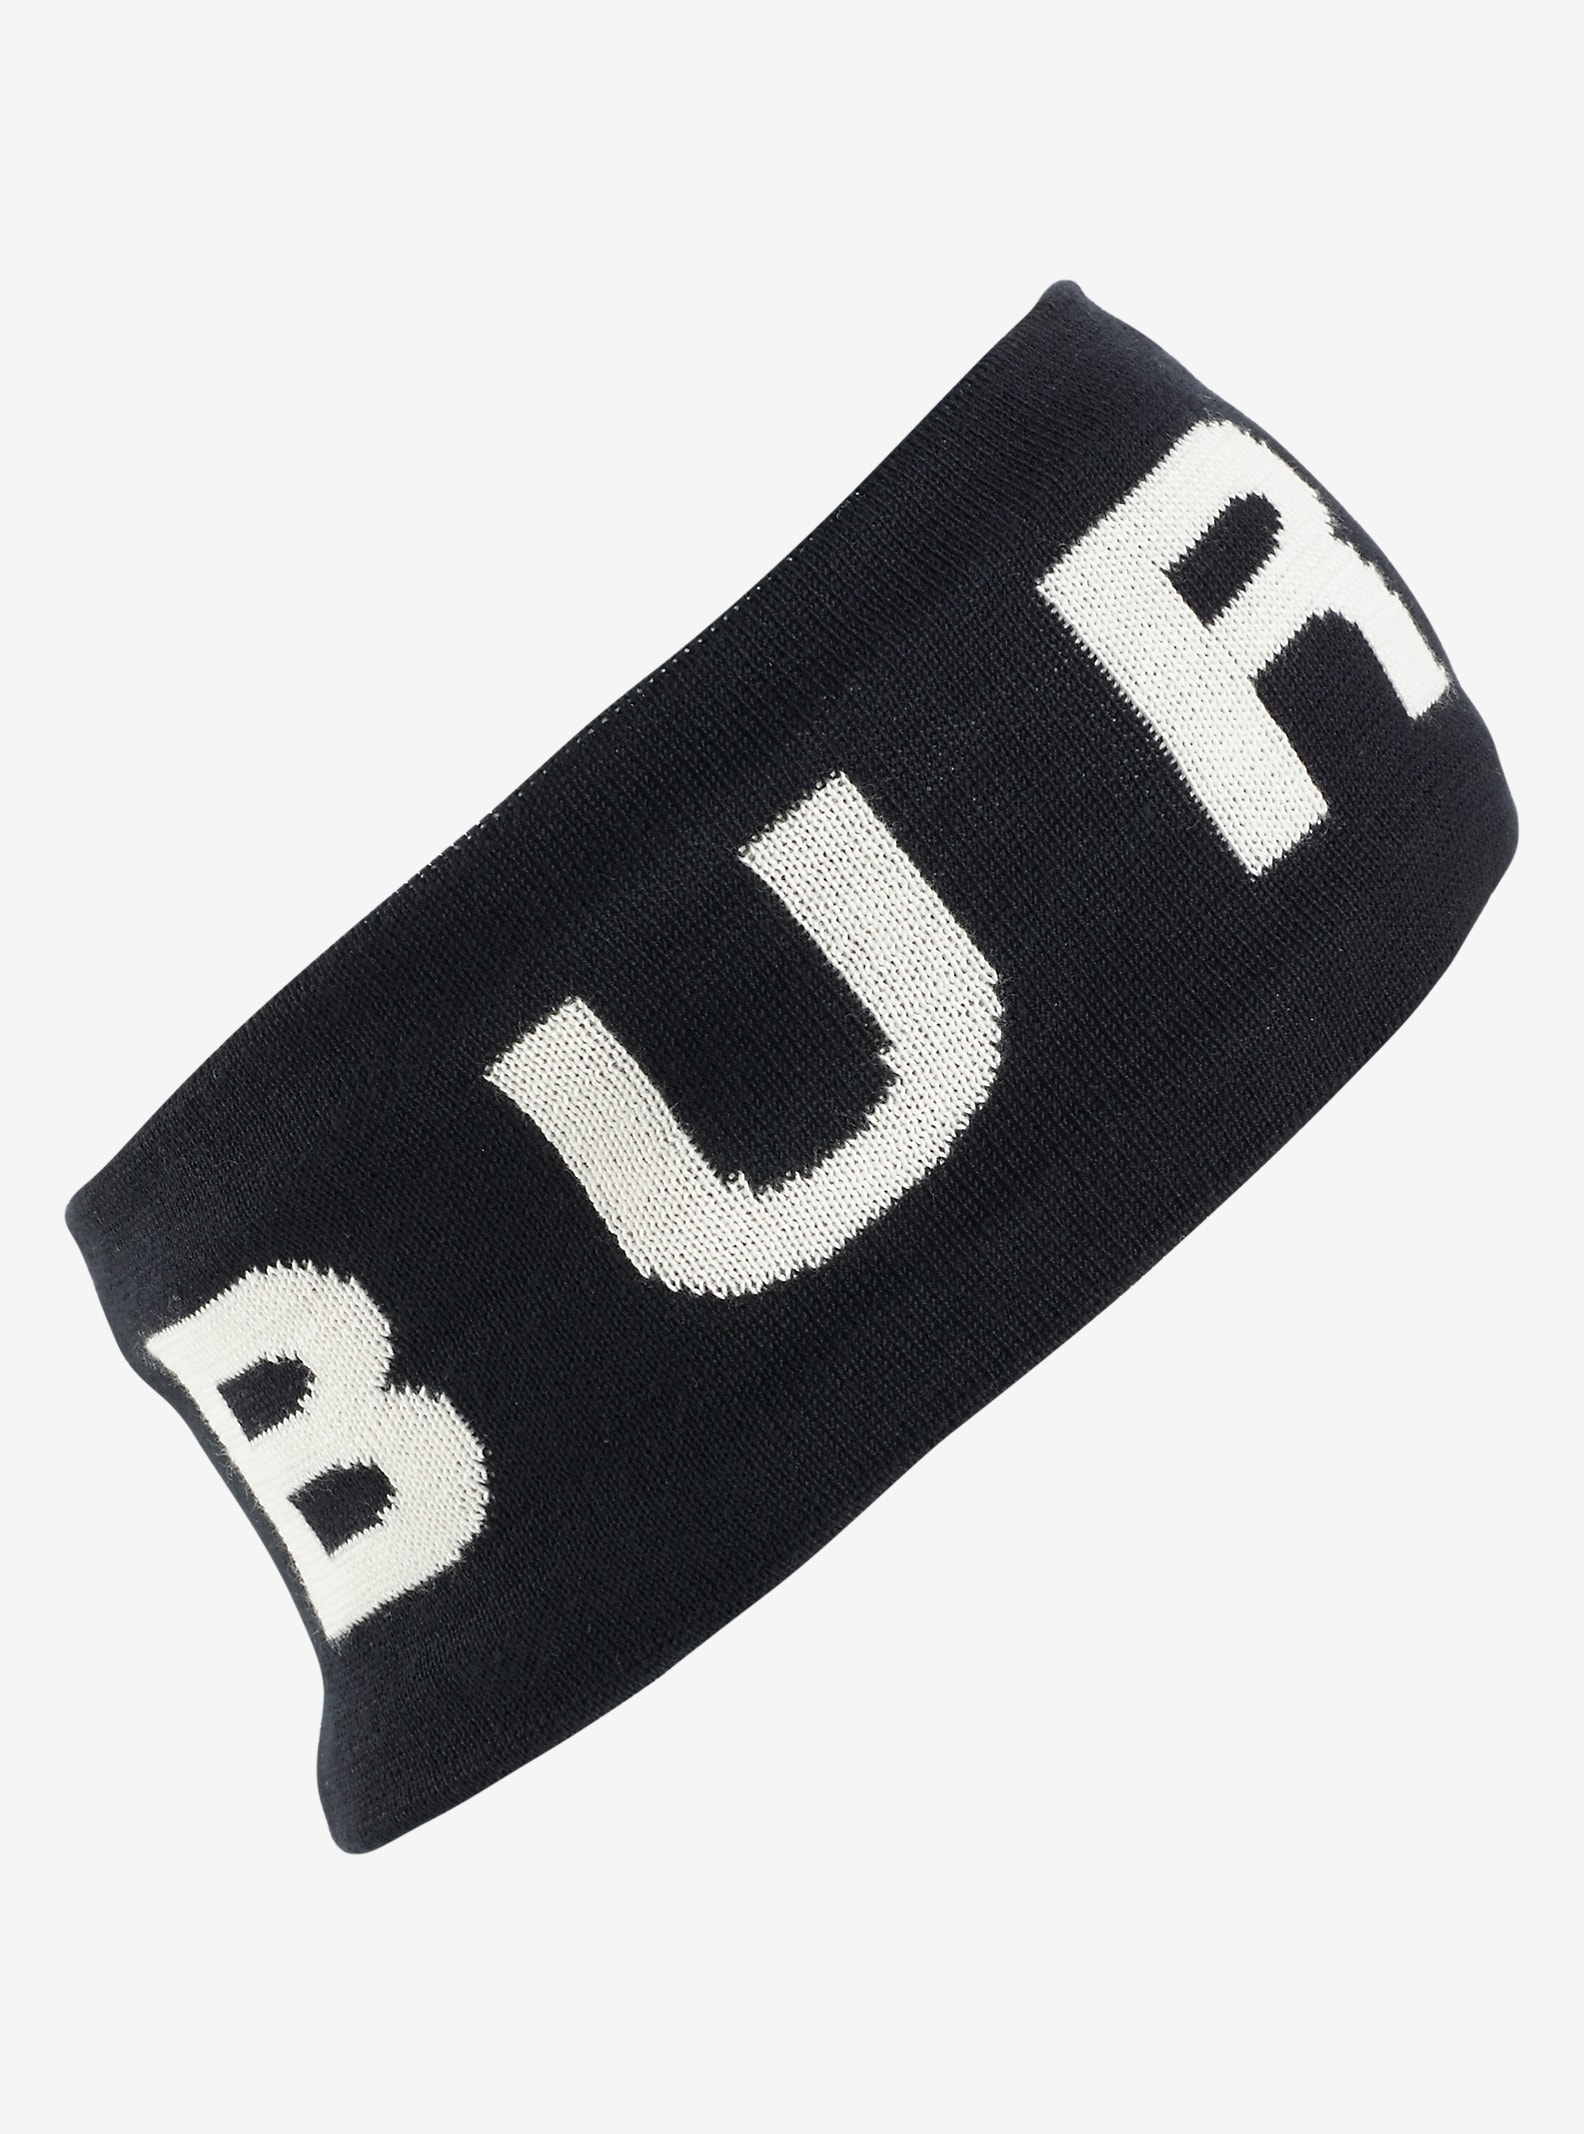 Burton Poledo Headband shown in Wordmark